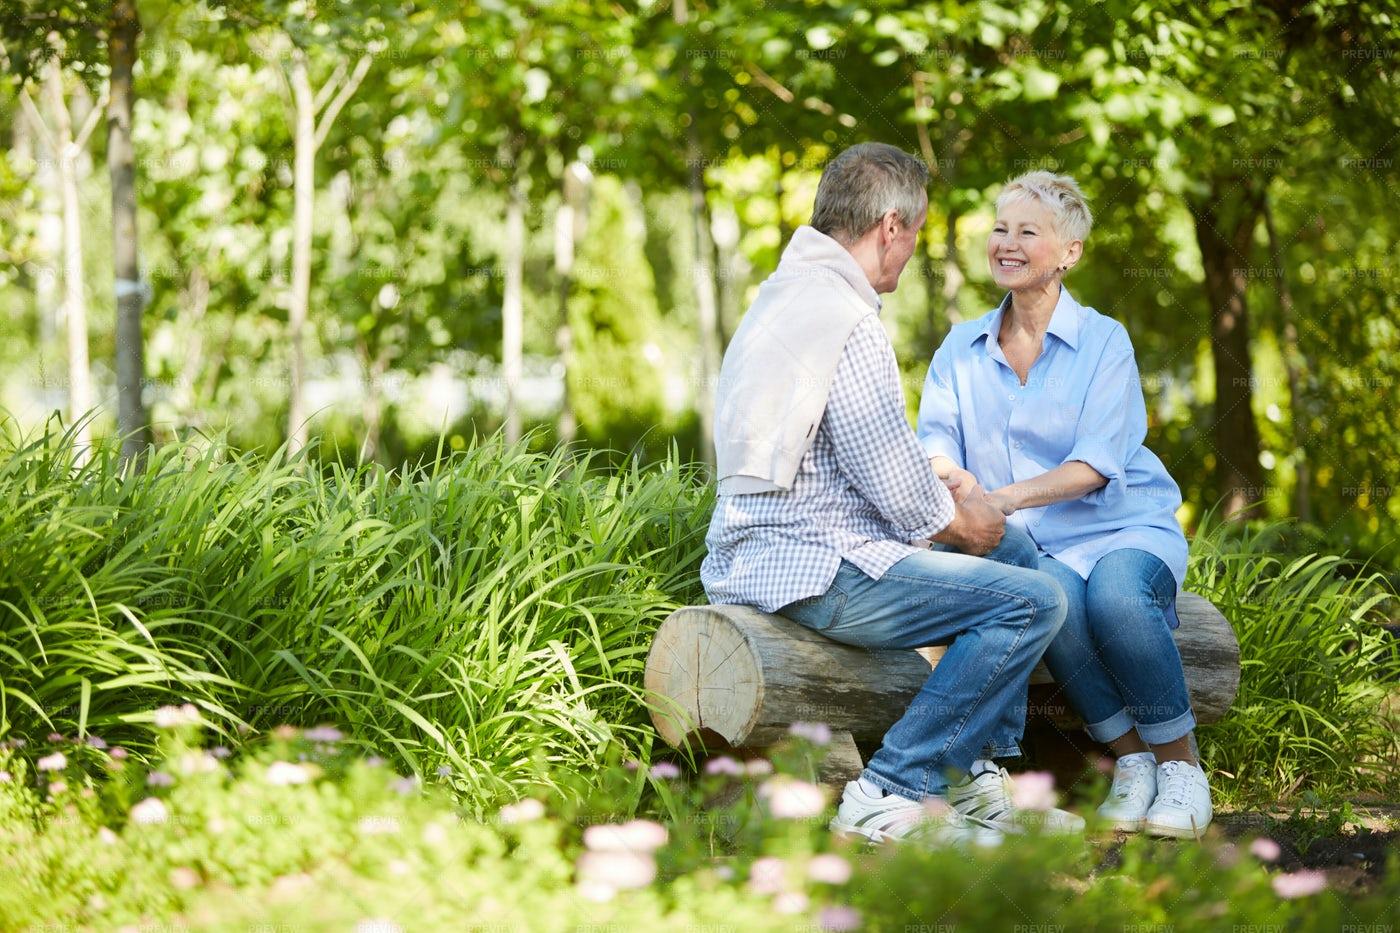 Senior Couple Enjoying Date In Park: Stock Photos